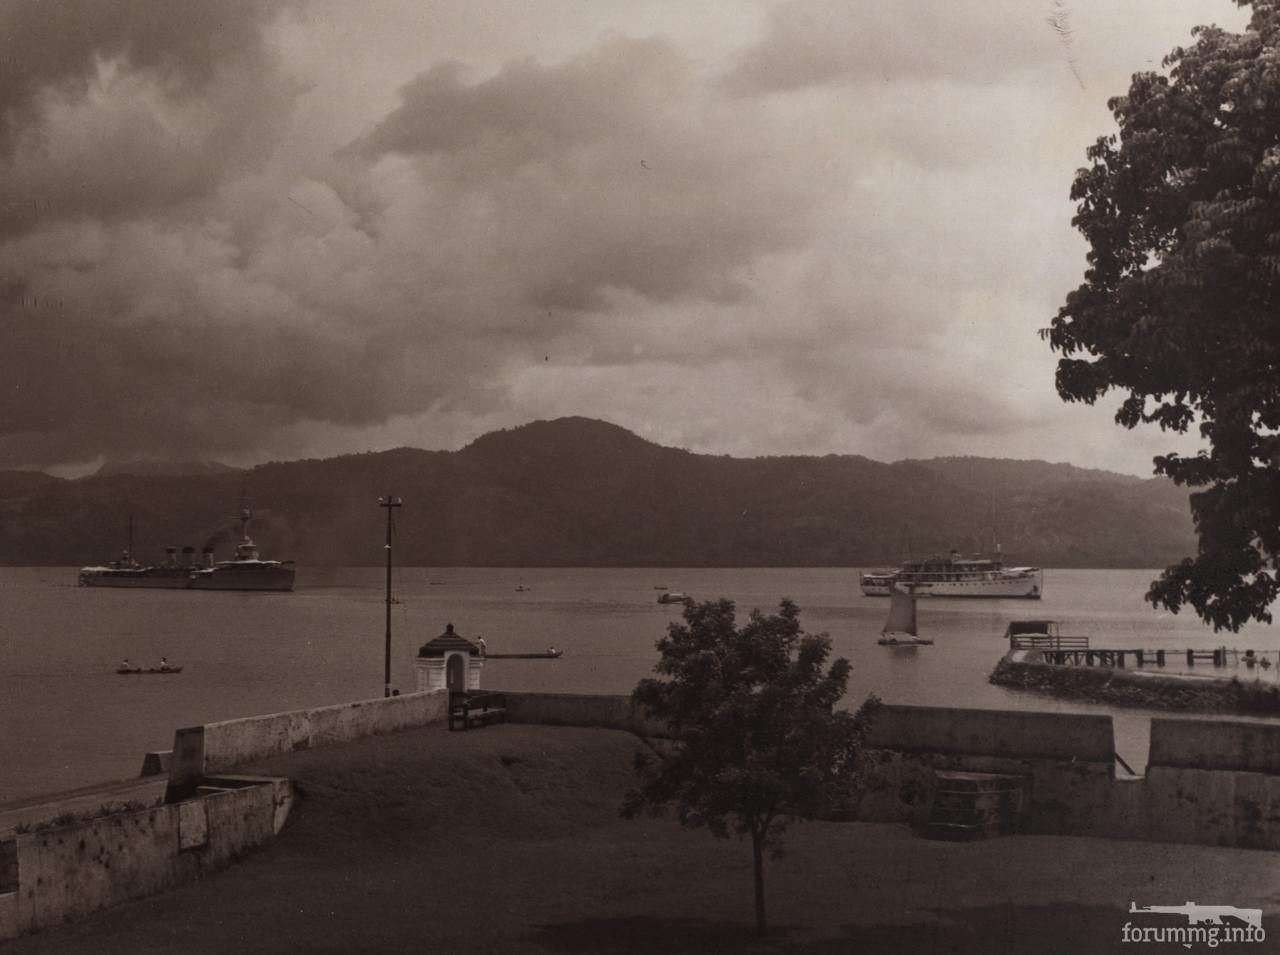 124415 - Легкий крейсер IJN Tatsuta, Индонезия, середина 1930-х гг. Фотография с форта Nieuw-Victoria, Амбон.